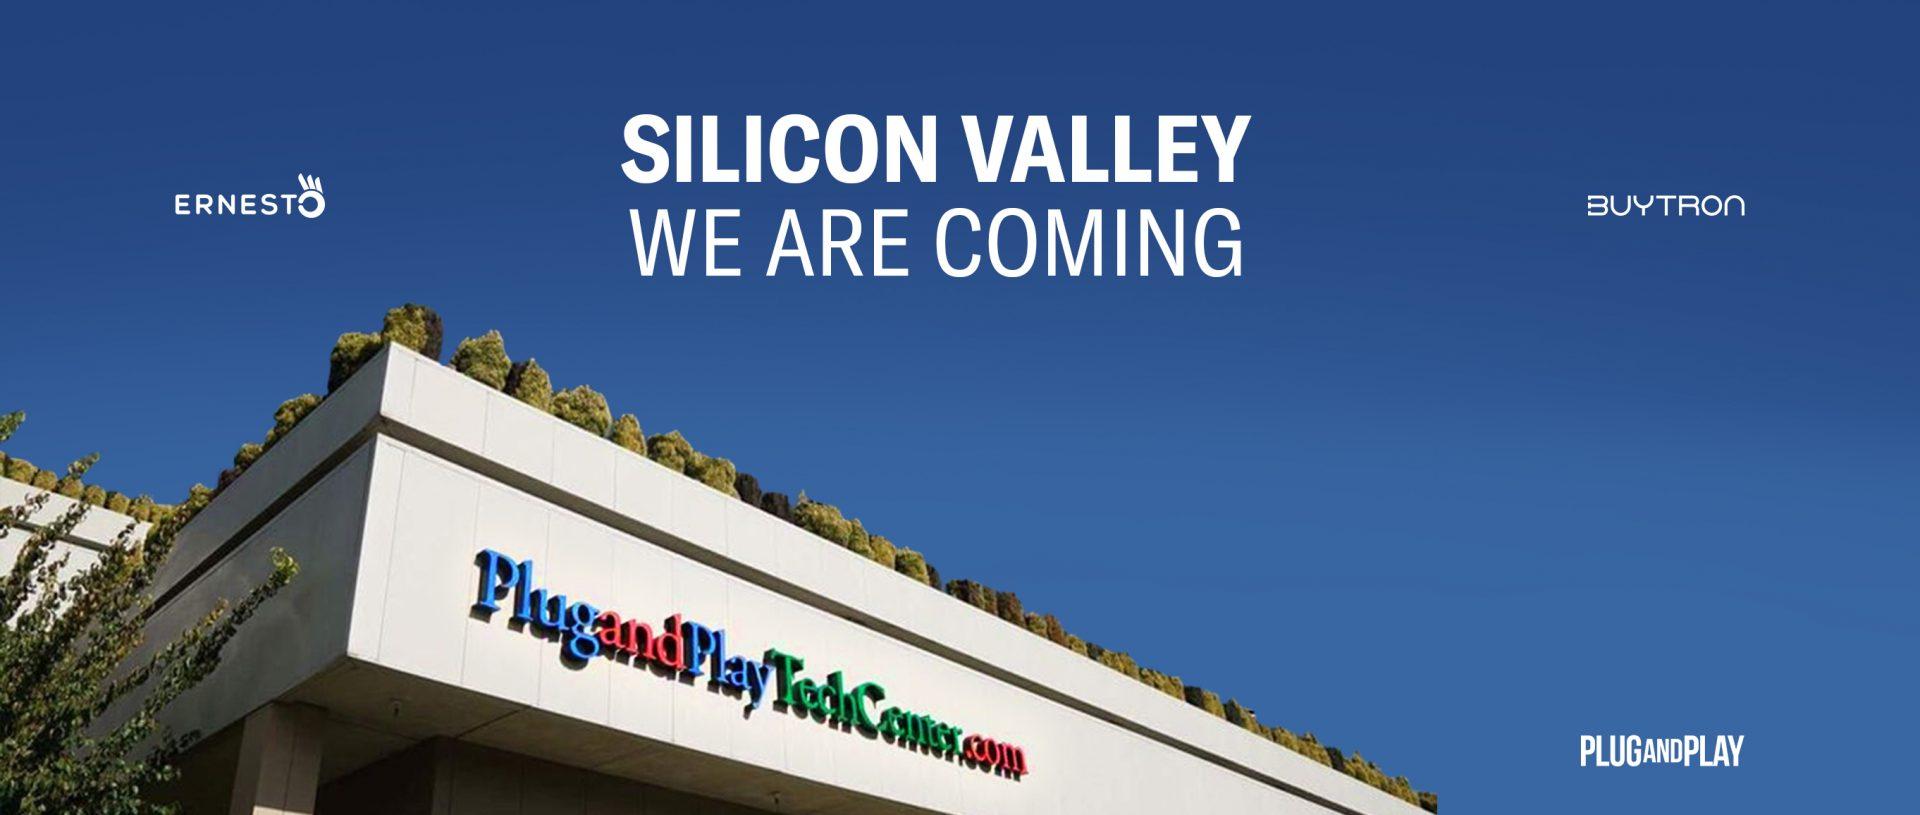 Buytron al Plug and Play in Silicon Valley